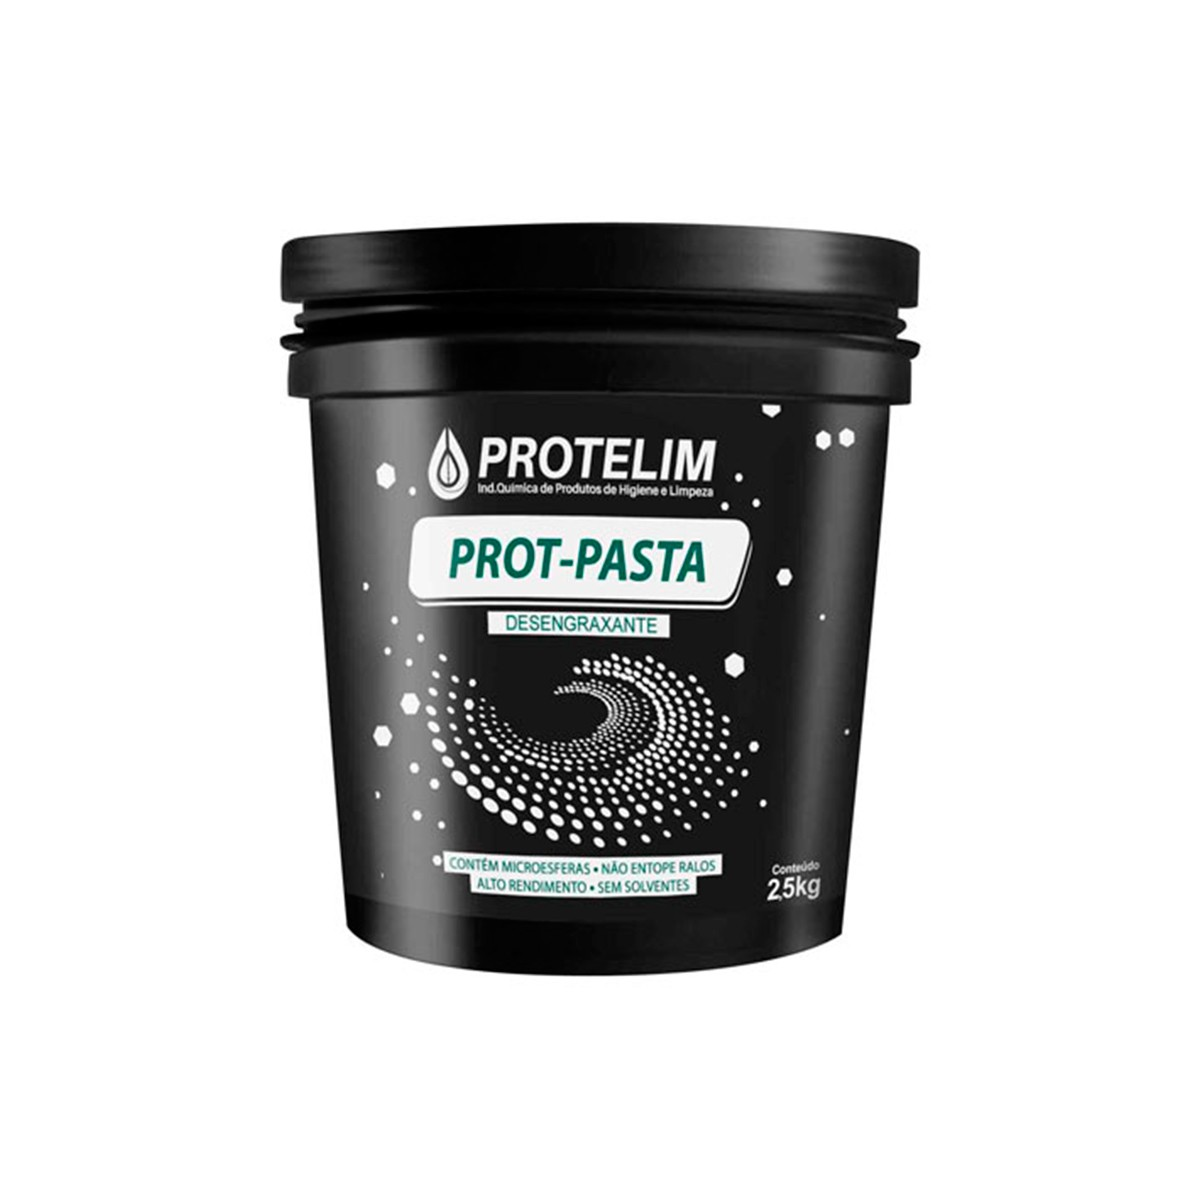 Prot Pasta Desengraxante 2,5kg - Protelim